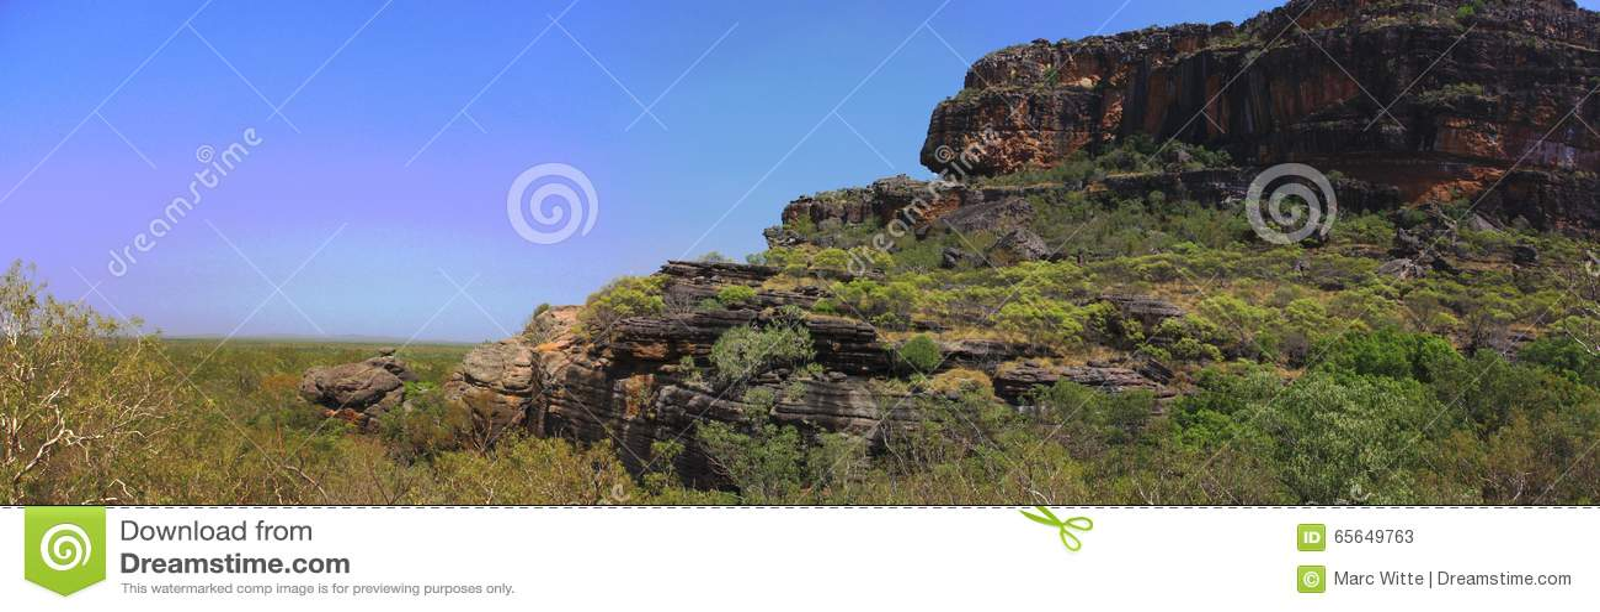 Nourlangie, parc national de kakadu, Australie